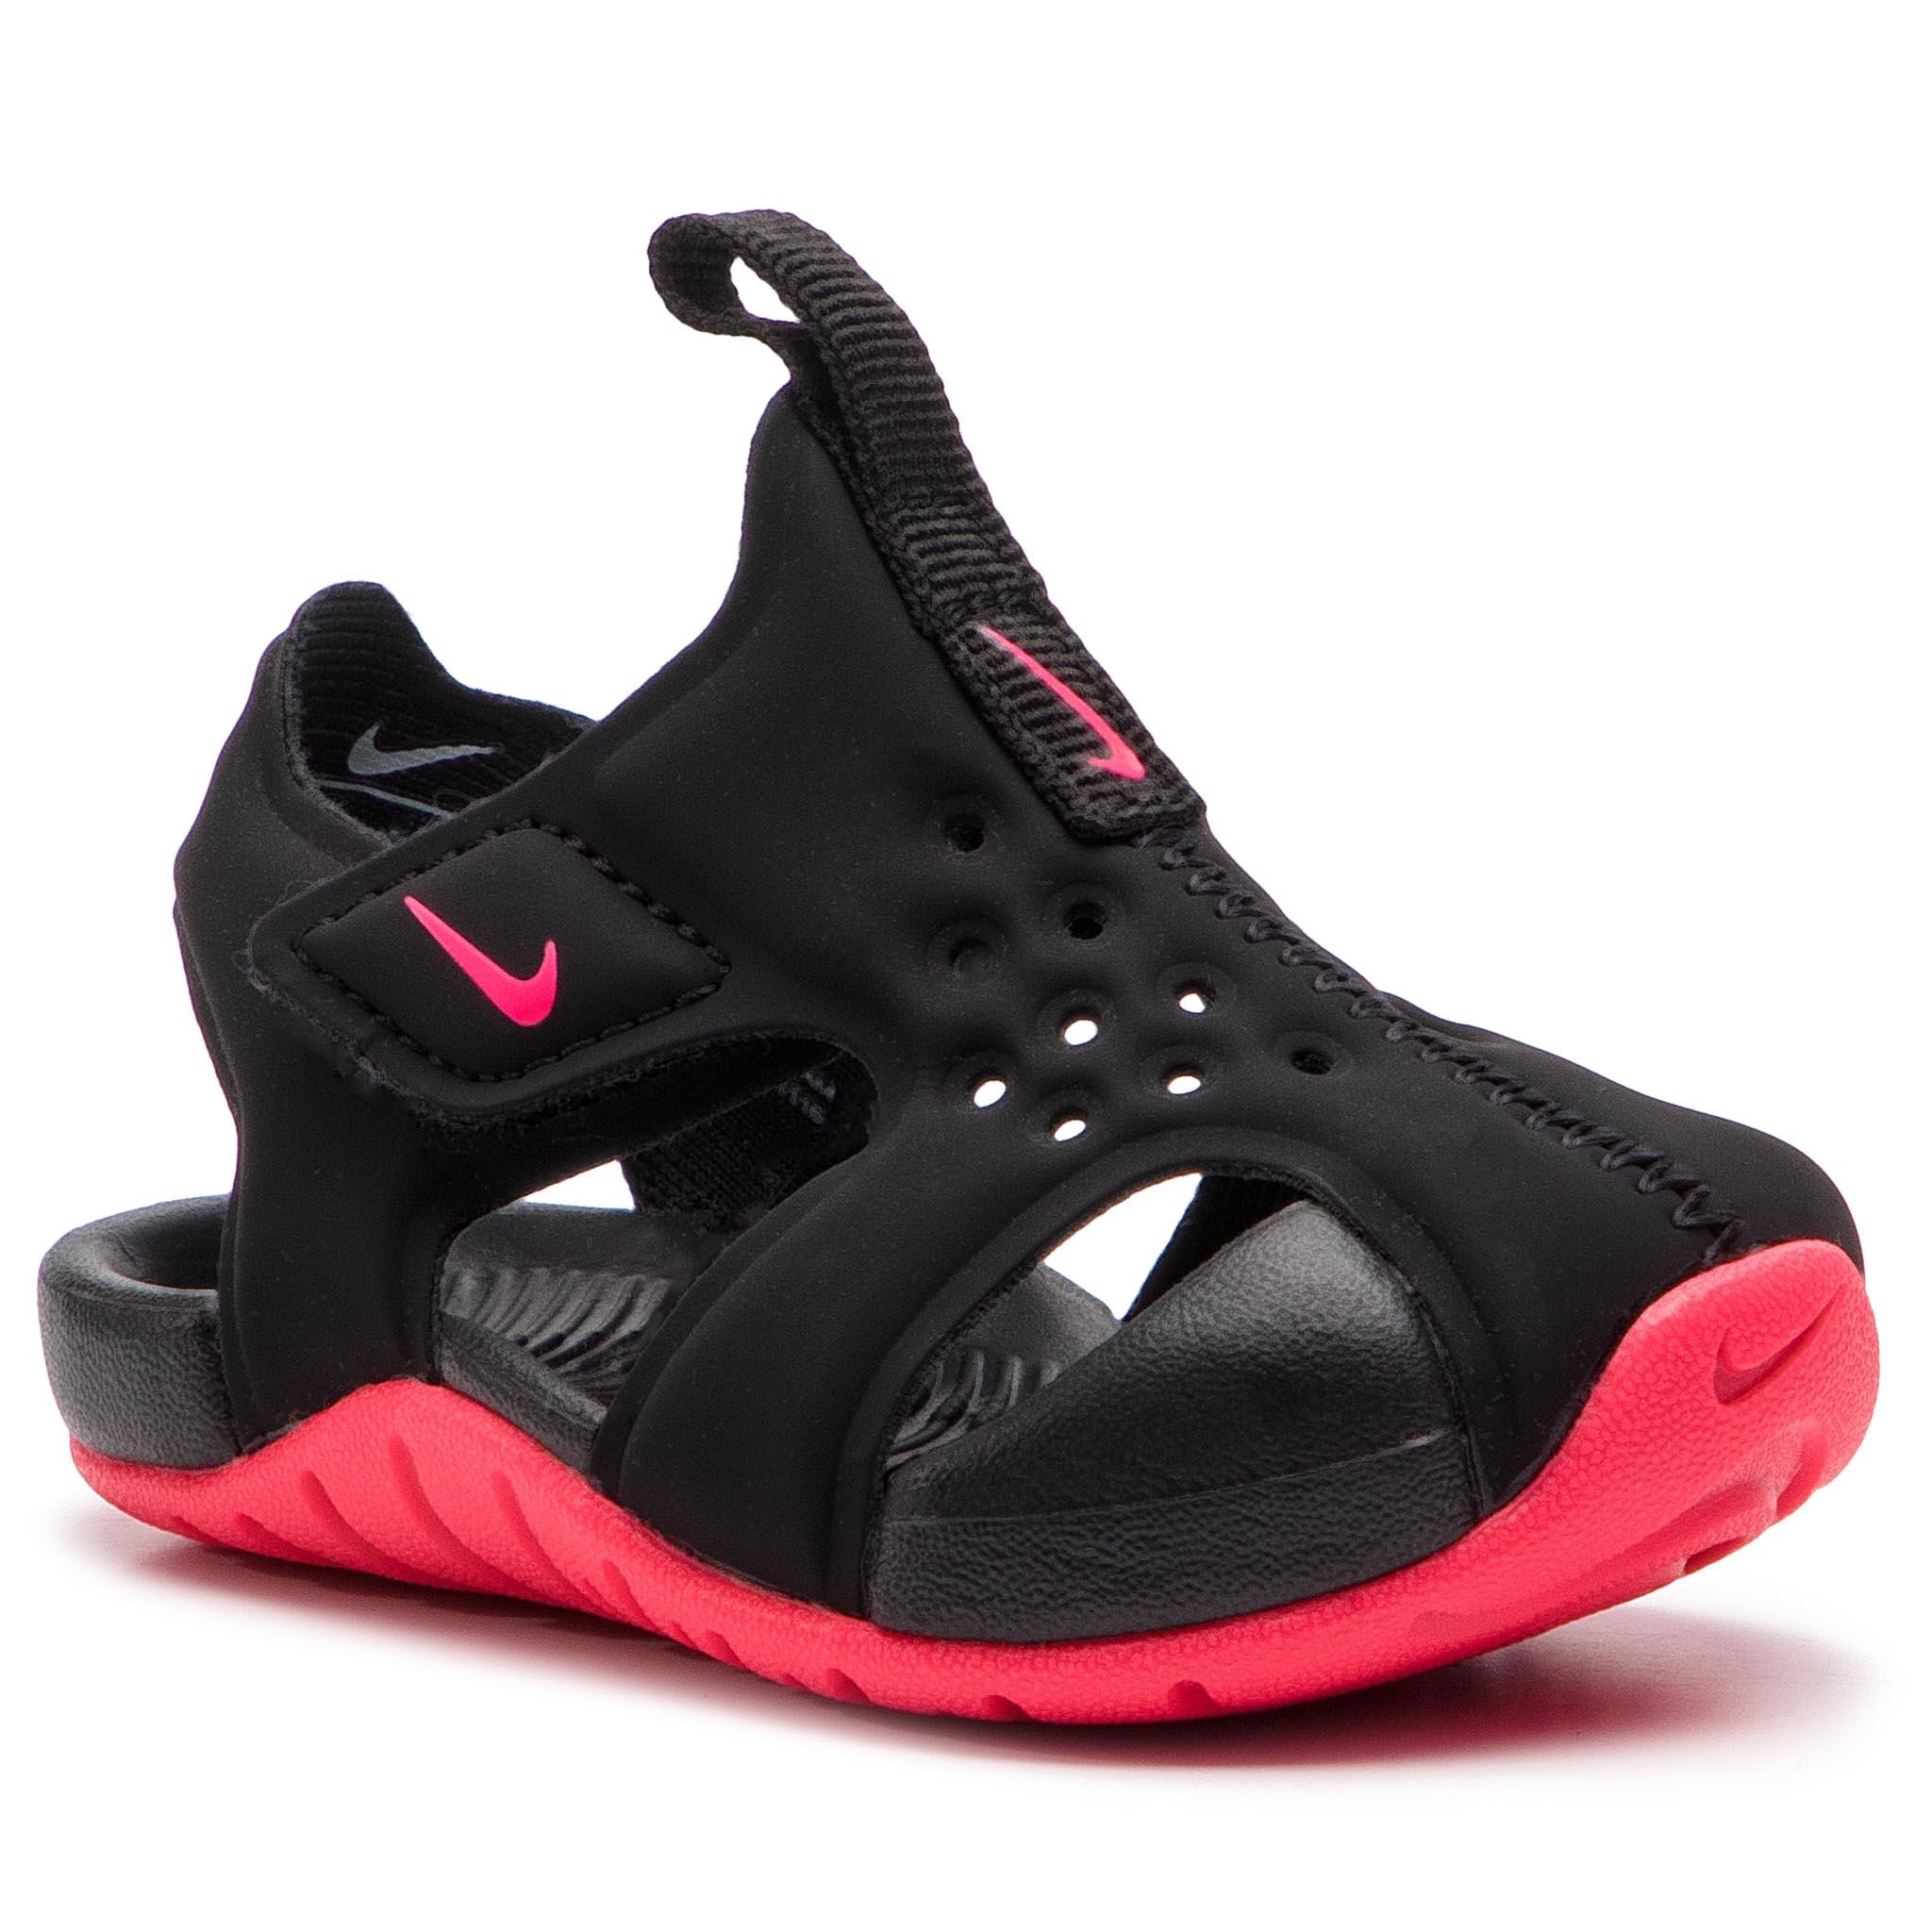 60550449e959 Sandals NIKE - Sunray Protect 2 (TD) 943827 001 Black White ...